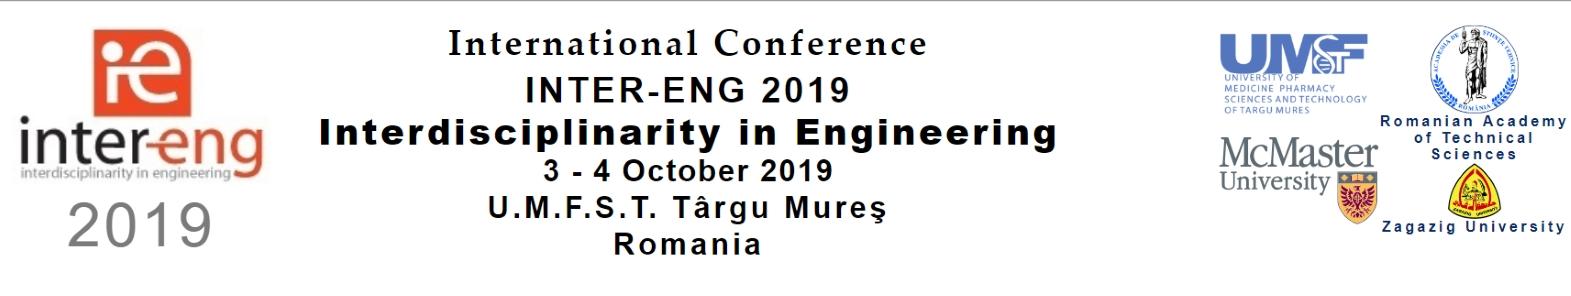 13th International Conference on Interdisciplinarity in Engineering